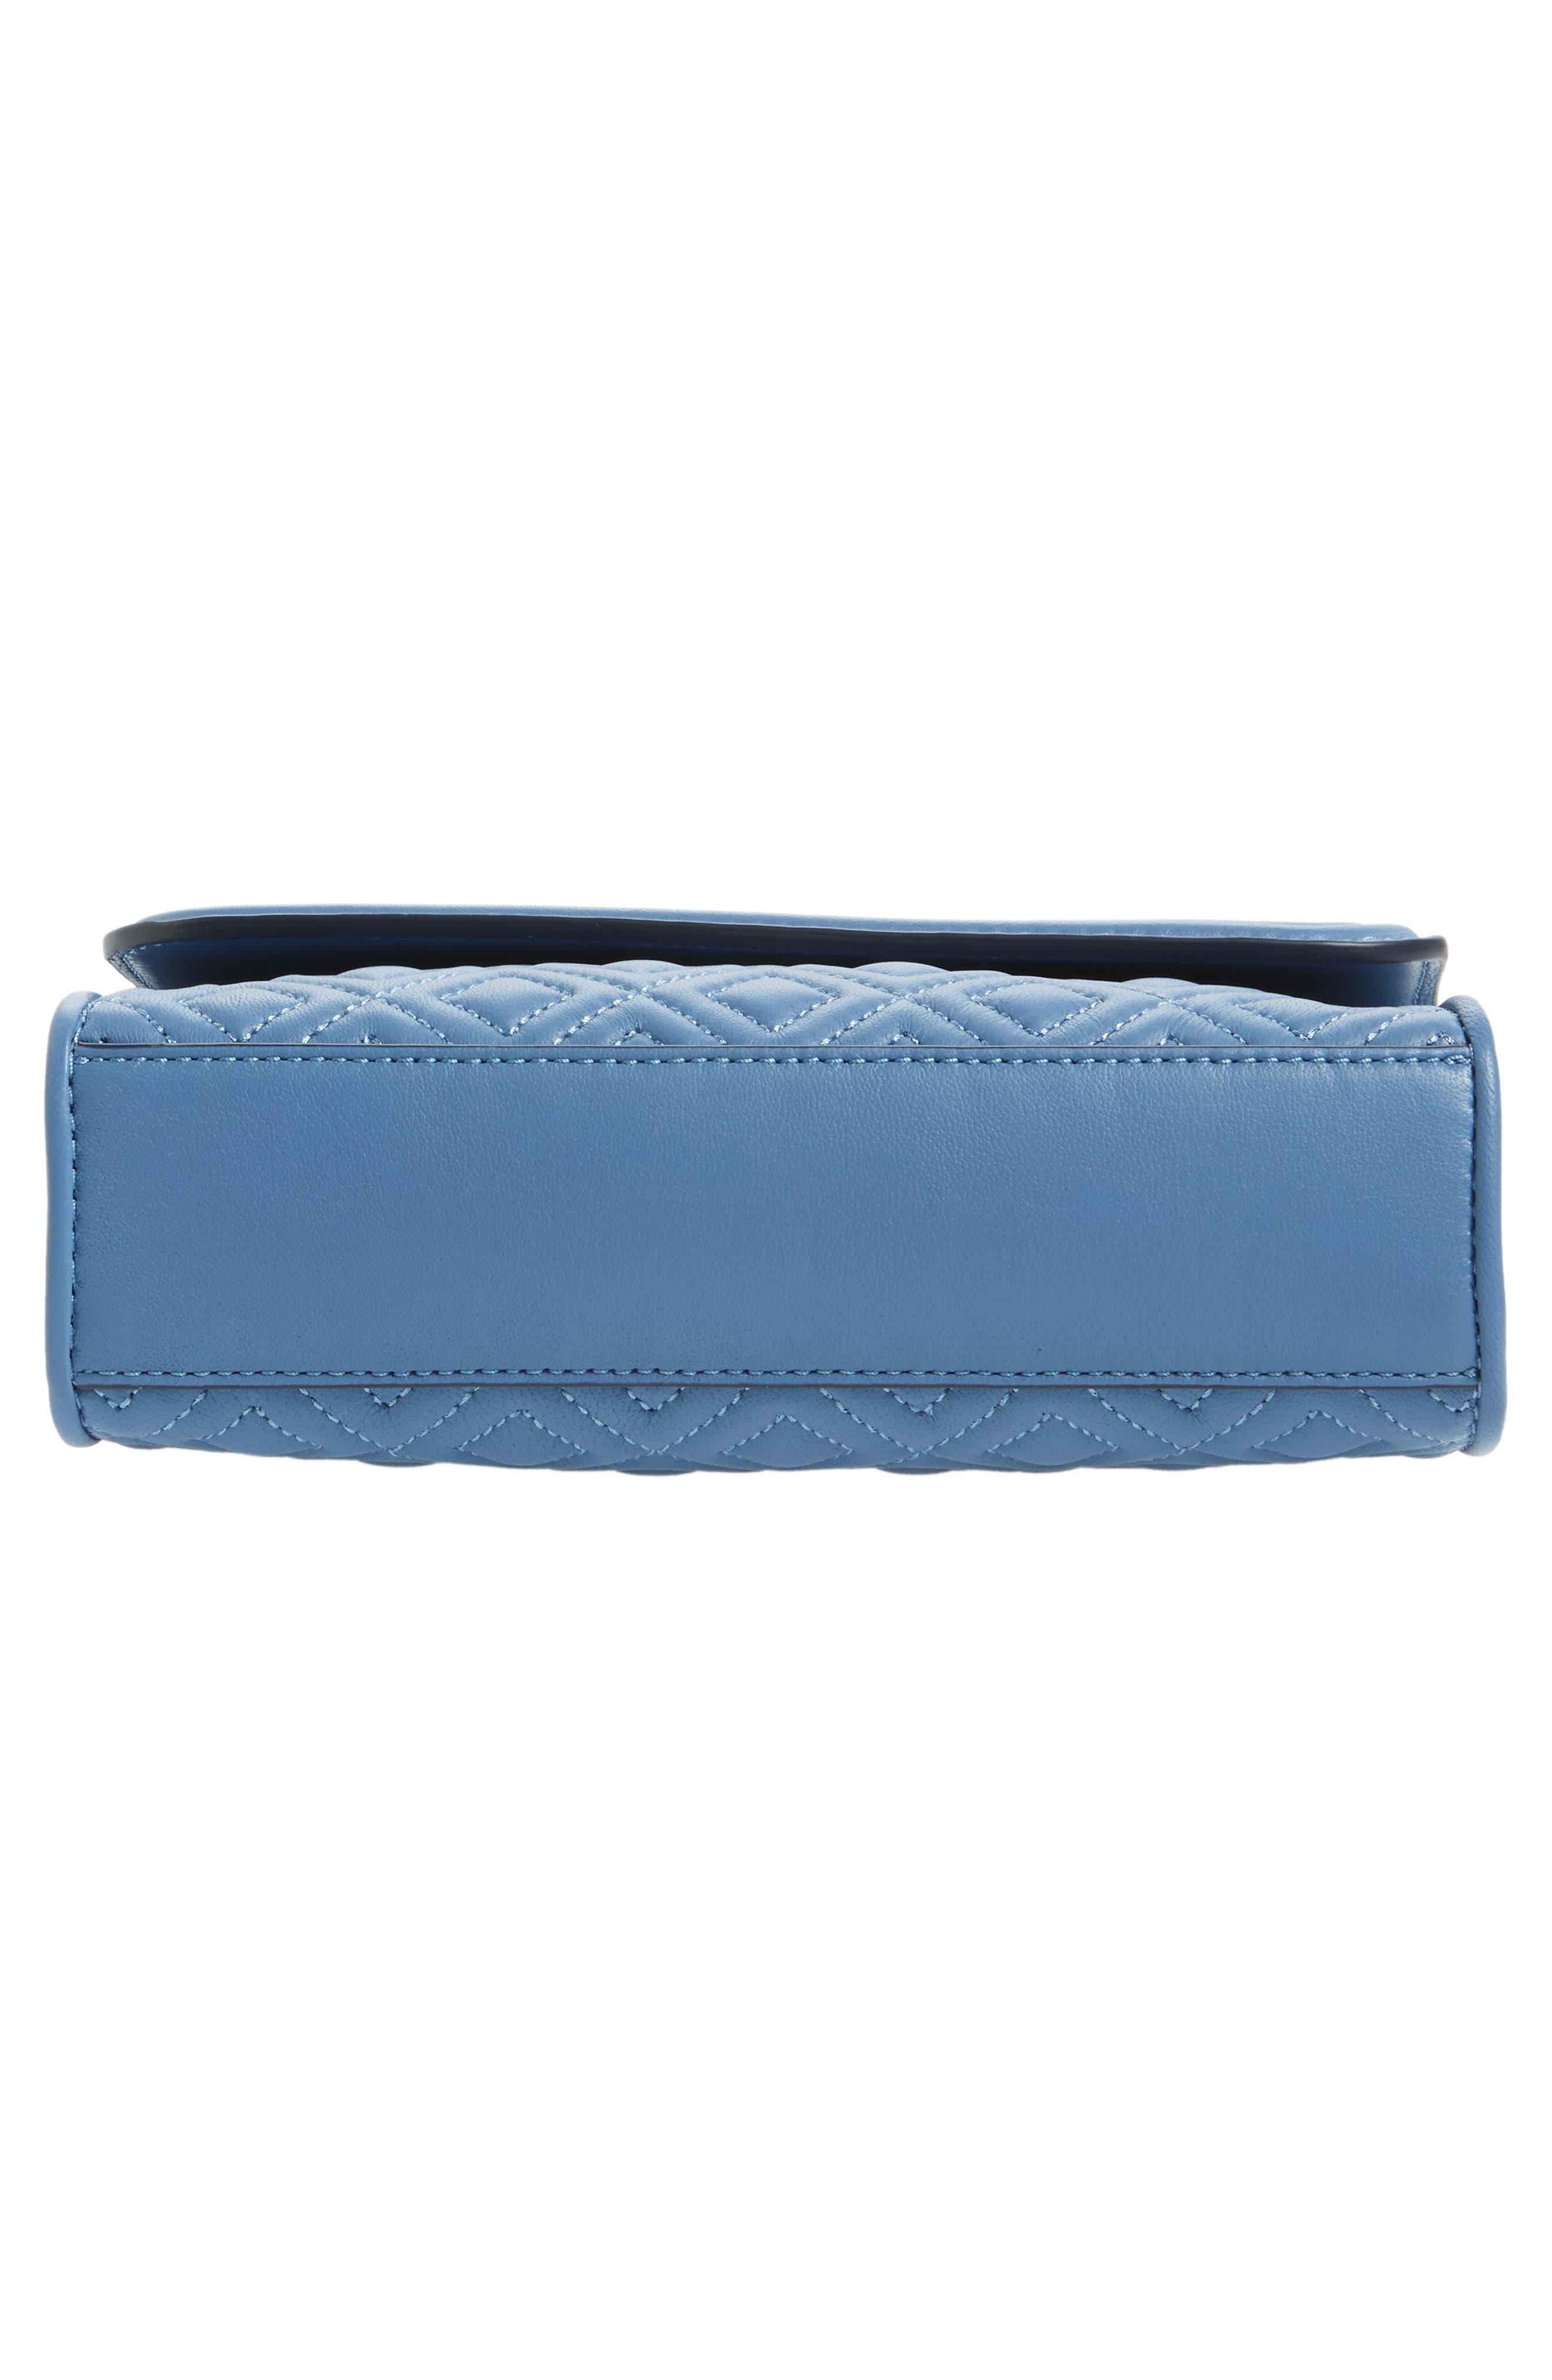 Fleming Convertible Leather Shoulder Bag,                             Alternate thumbnail 6, color,                             401